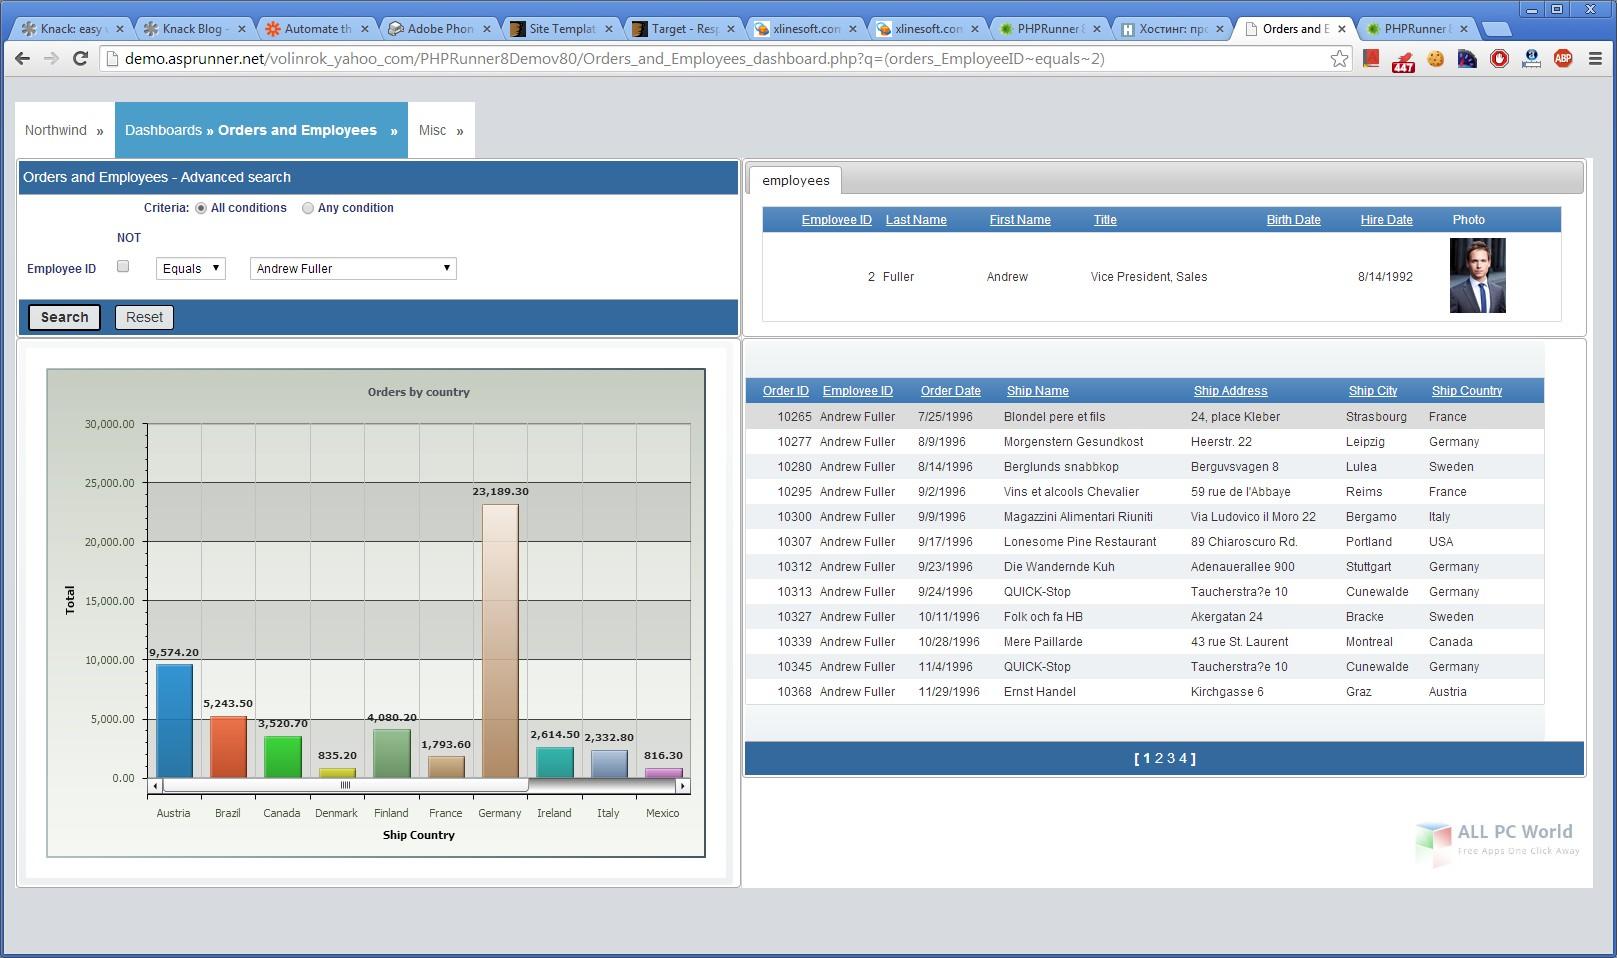 PHPRunner 9.0 Professional